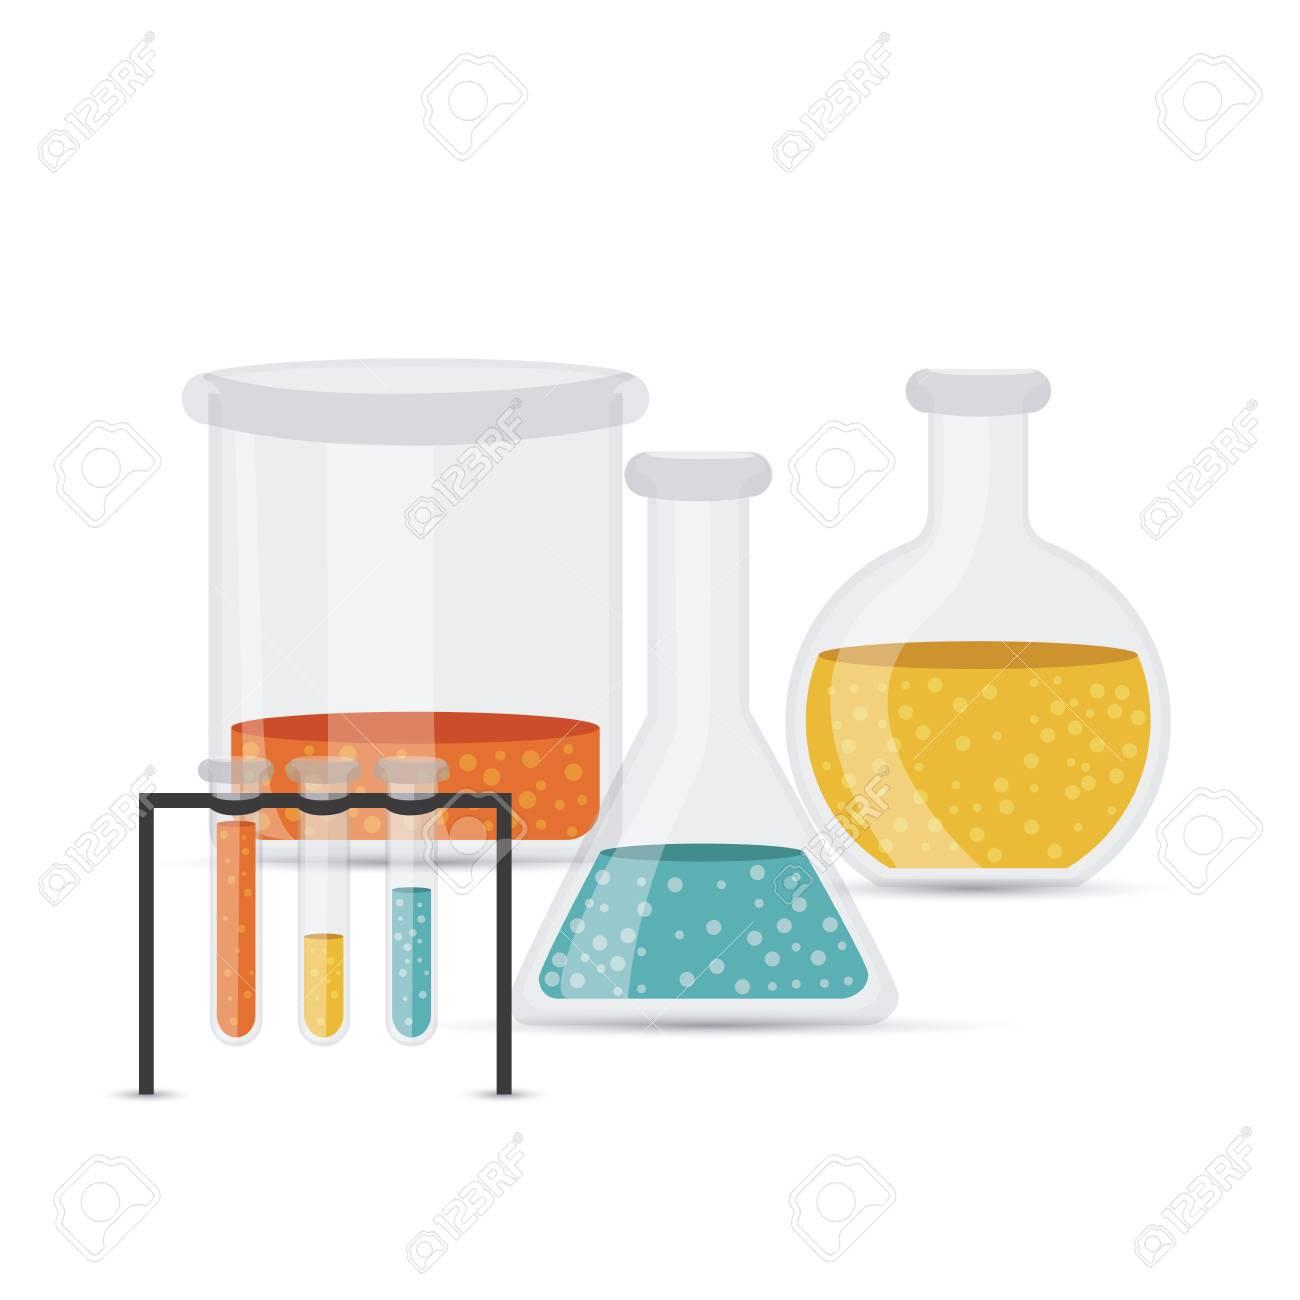 test tubes over white background vector illustration Stock Vector - 22453448